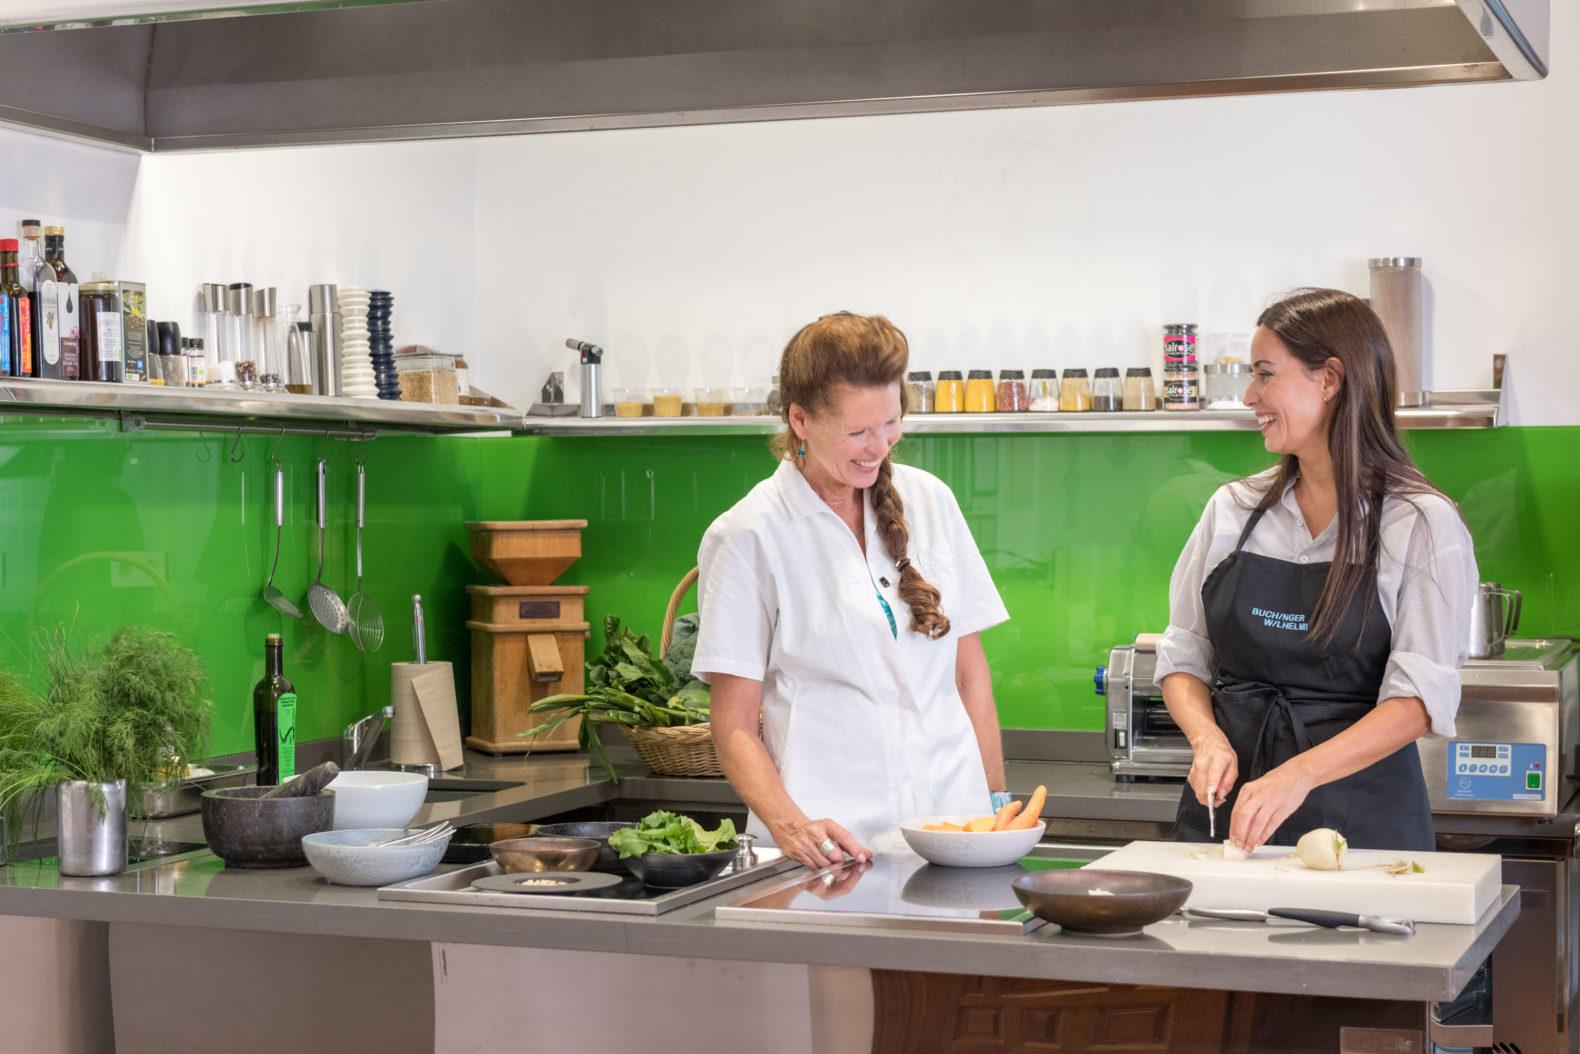 cooking-class-buchinger-wilhelmi-marbella-spain